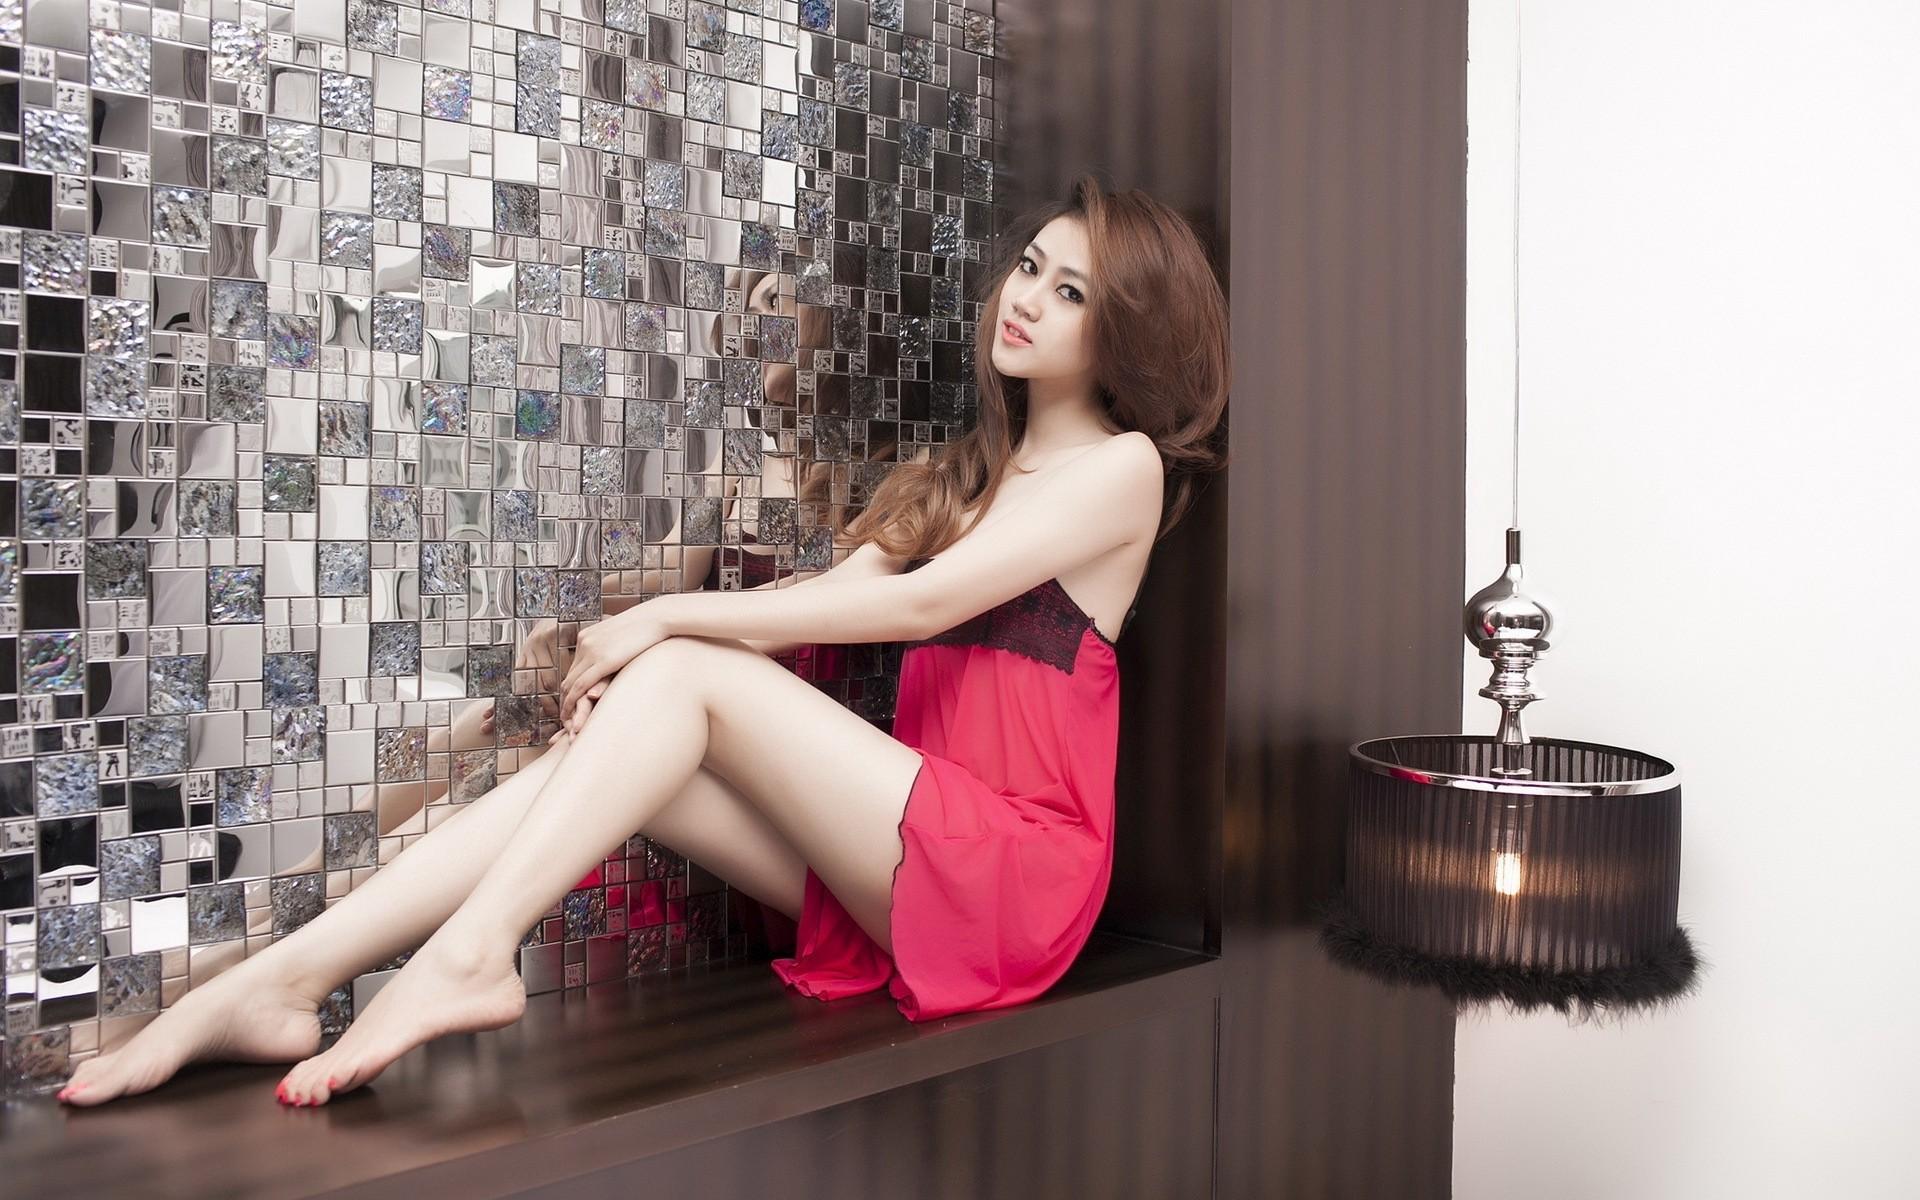 People 1920x1200 women model hair   brunette dress pink dress legs looking at viewer sitting Asian barefoot